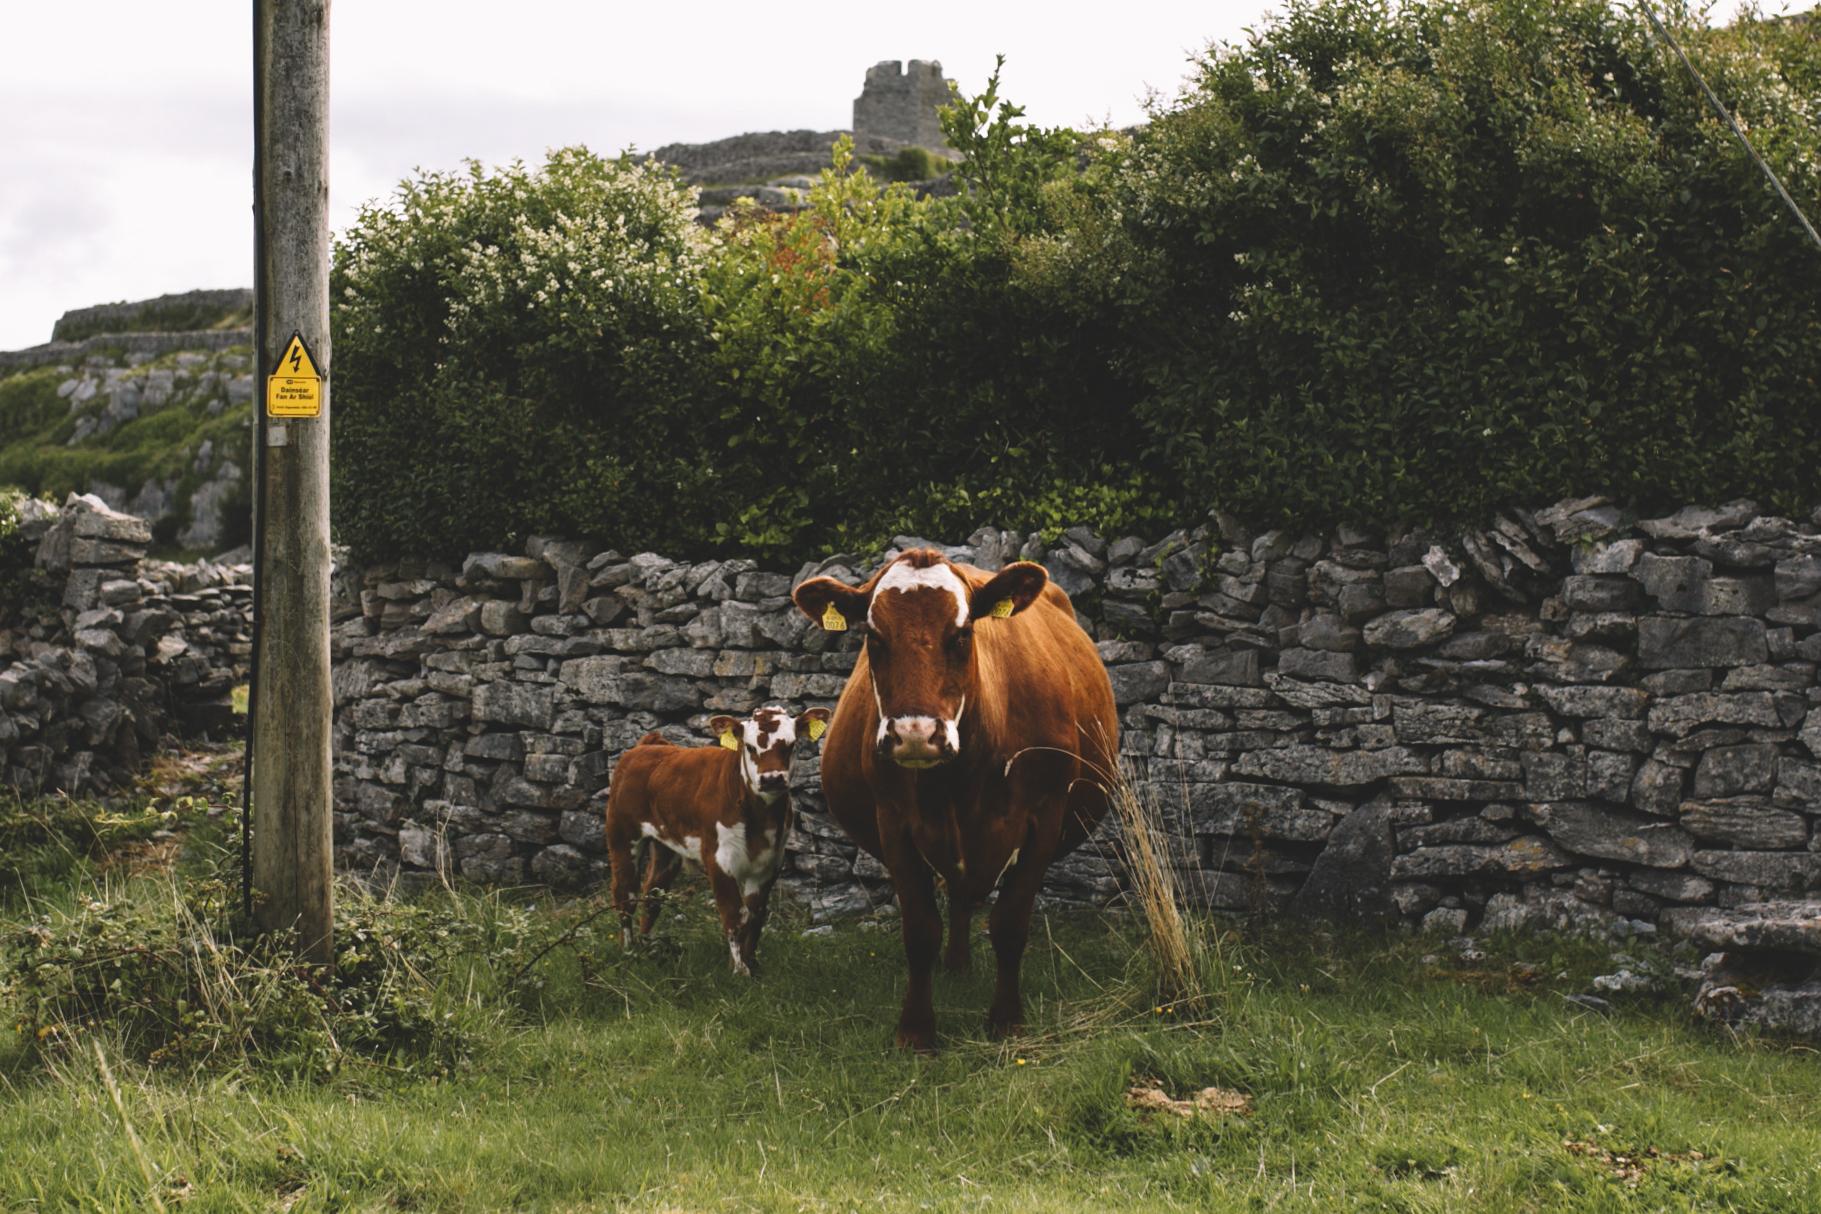 10 Tear Anniversary Trip - Aran Island Inis Mor Inis Orr Ireland  (43 of 73).jpg